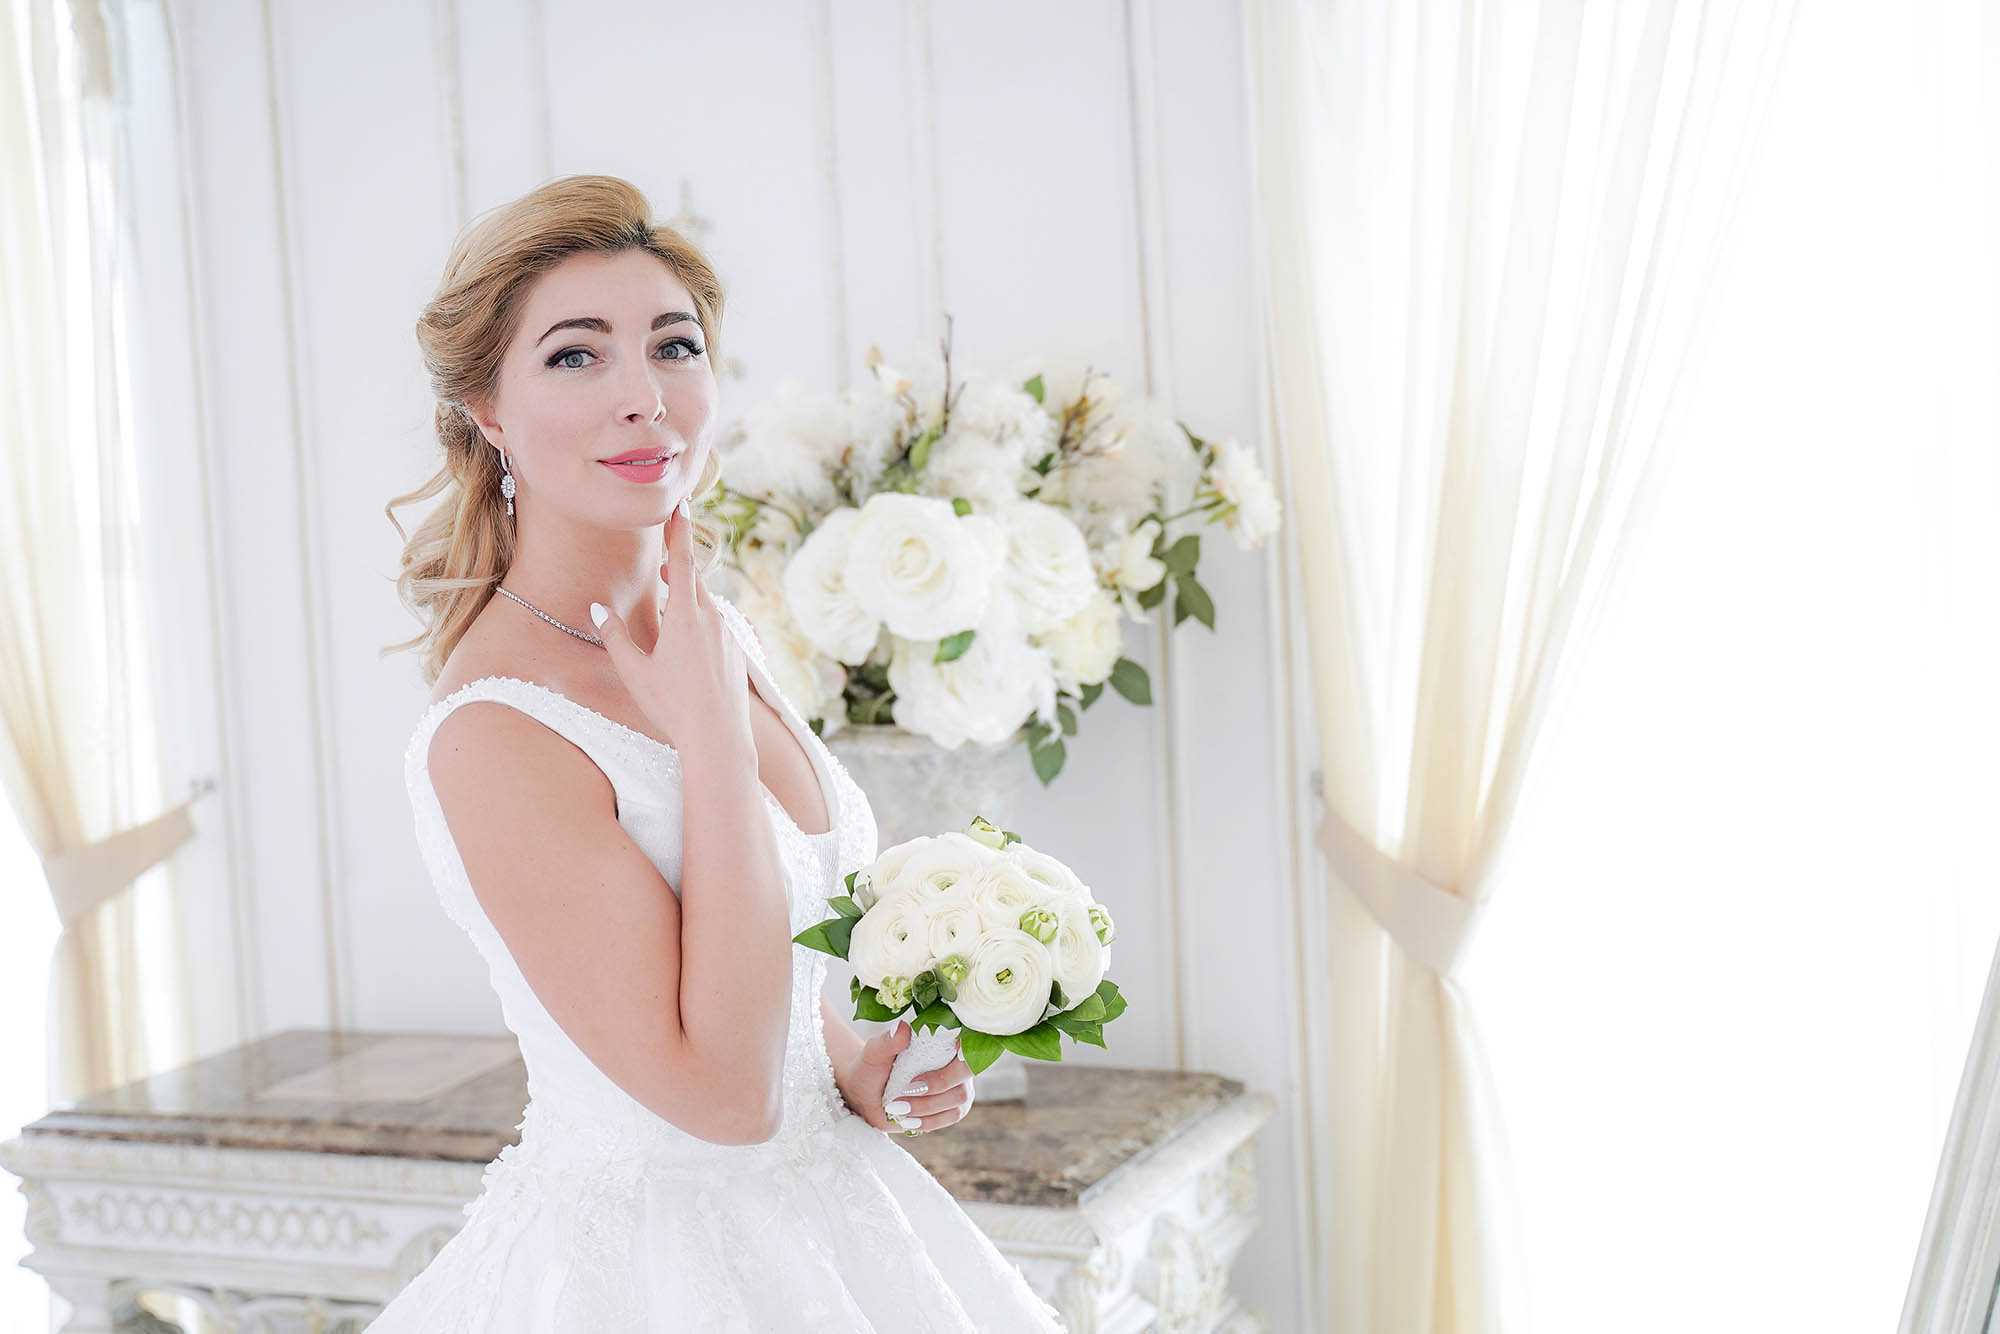 невеста в возрасте фото